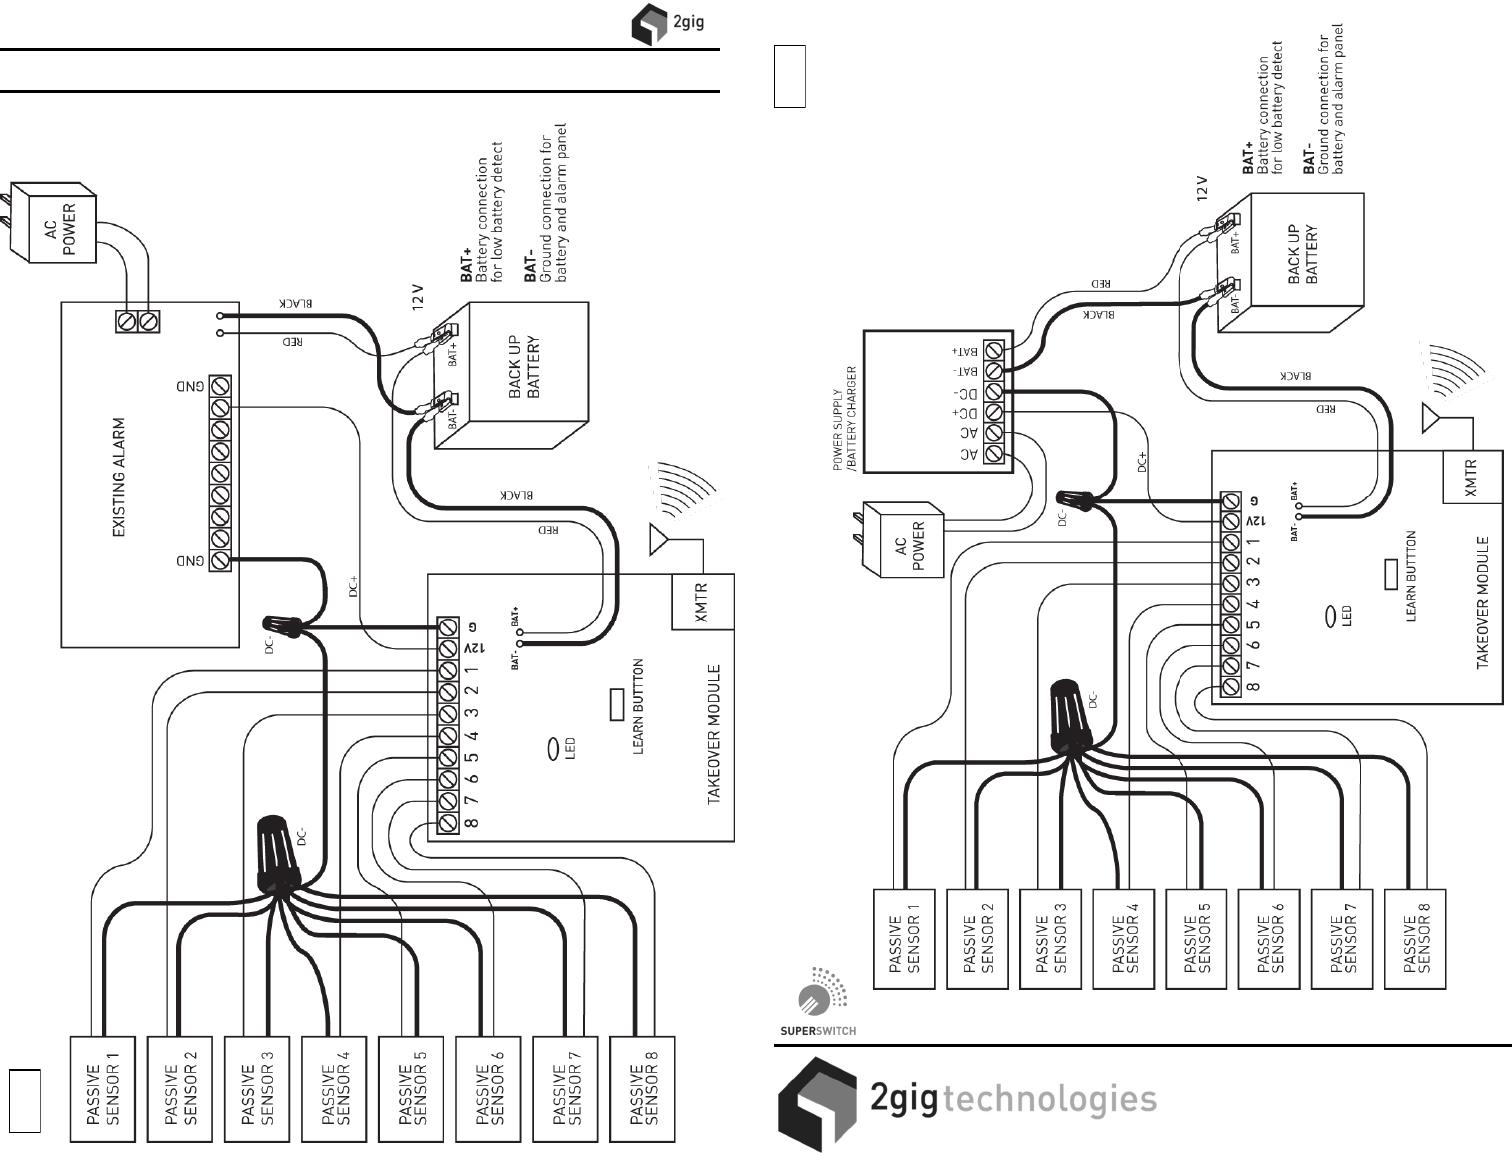 2gig Wiring Diagram Electrical Diagrams Simon Xt Take 345 Super Switch Wireless Takeover Module Manual Ladder